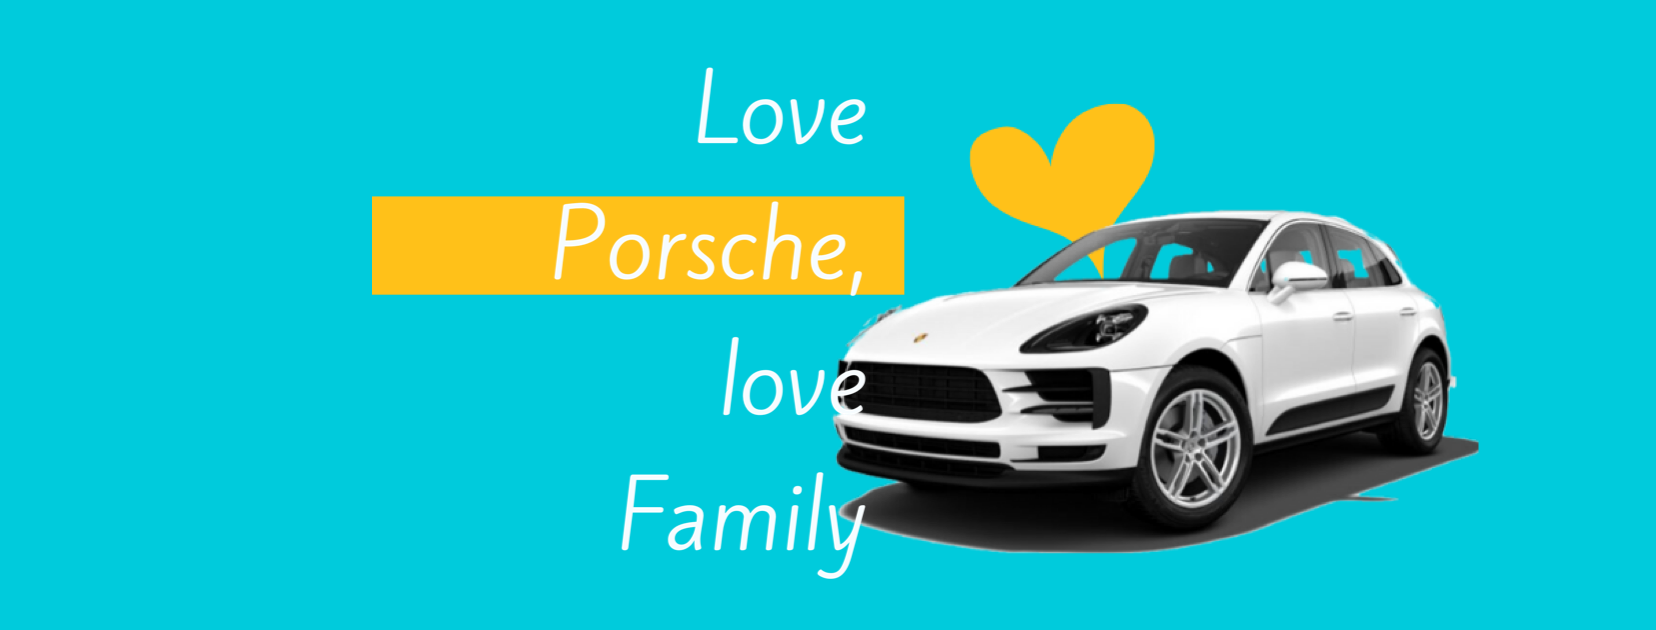 Love Porsche, love Family